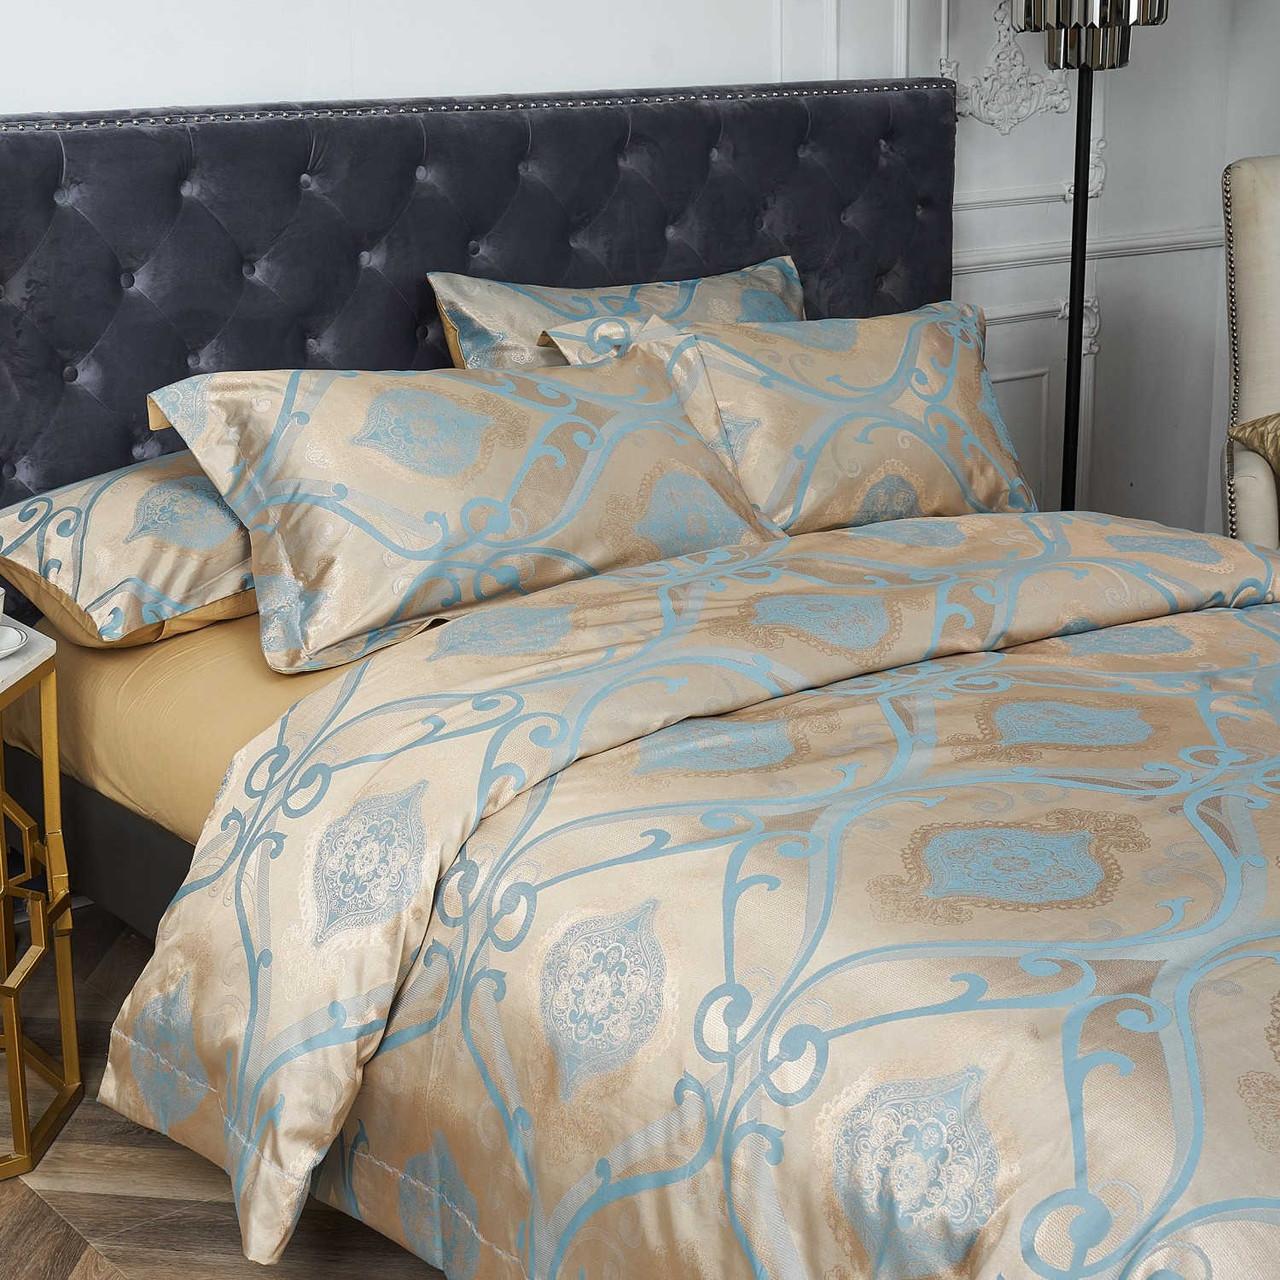 Dropshipping Wholesale Jacquard Bedding Set DM804K